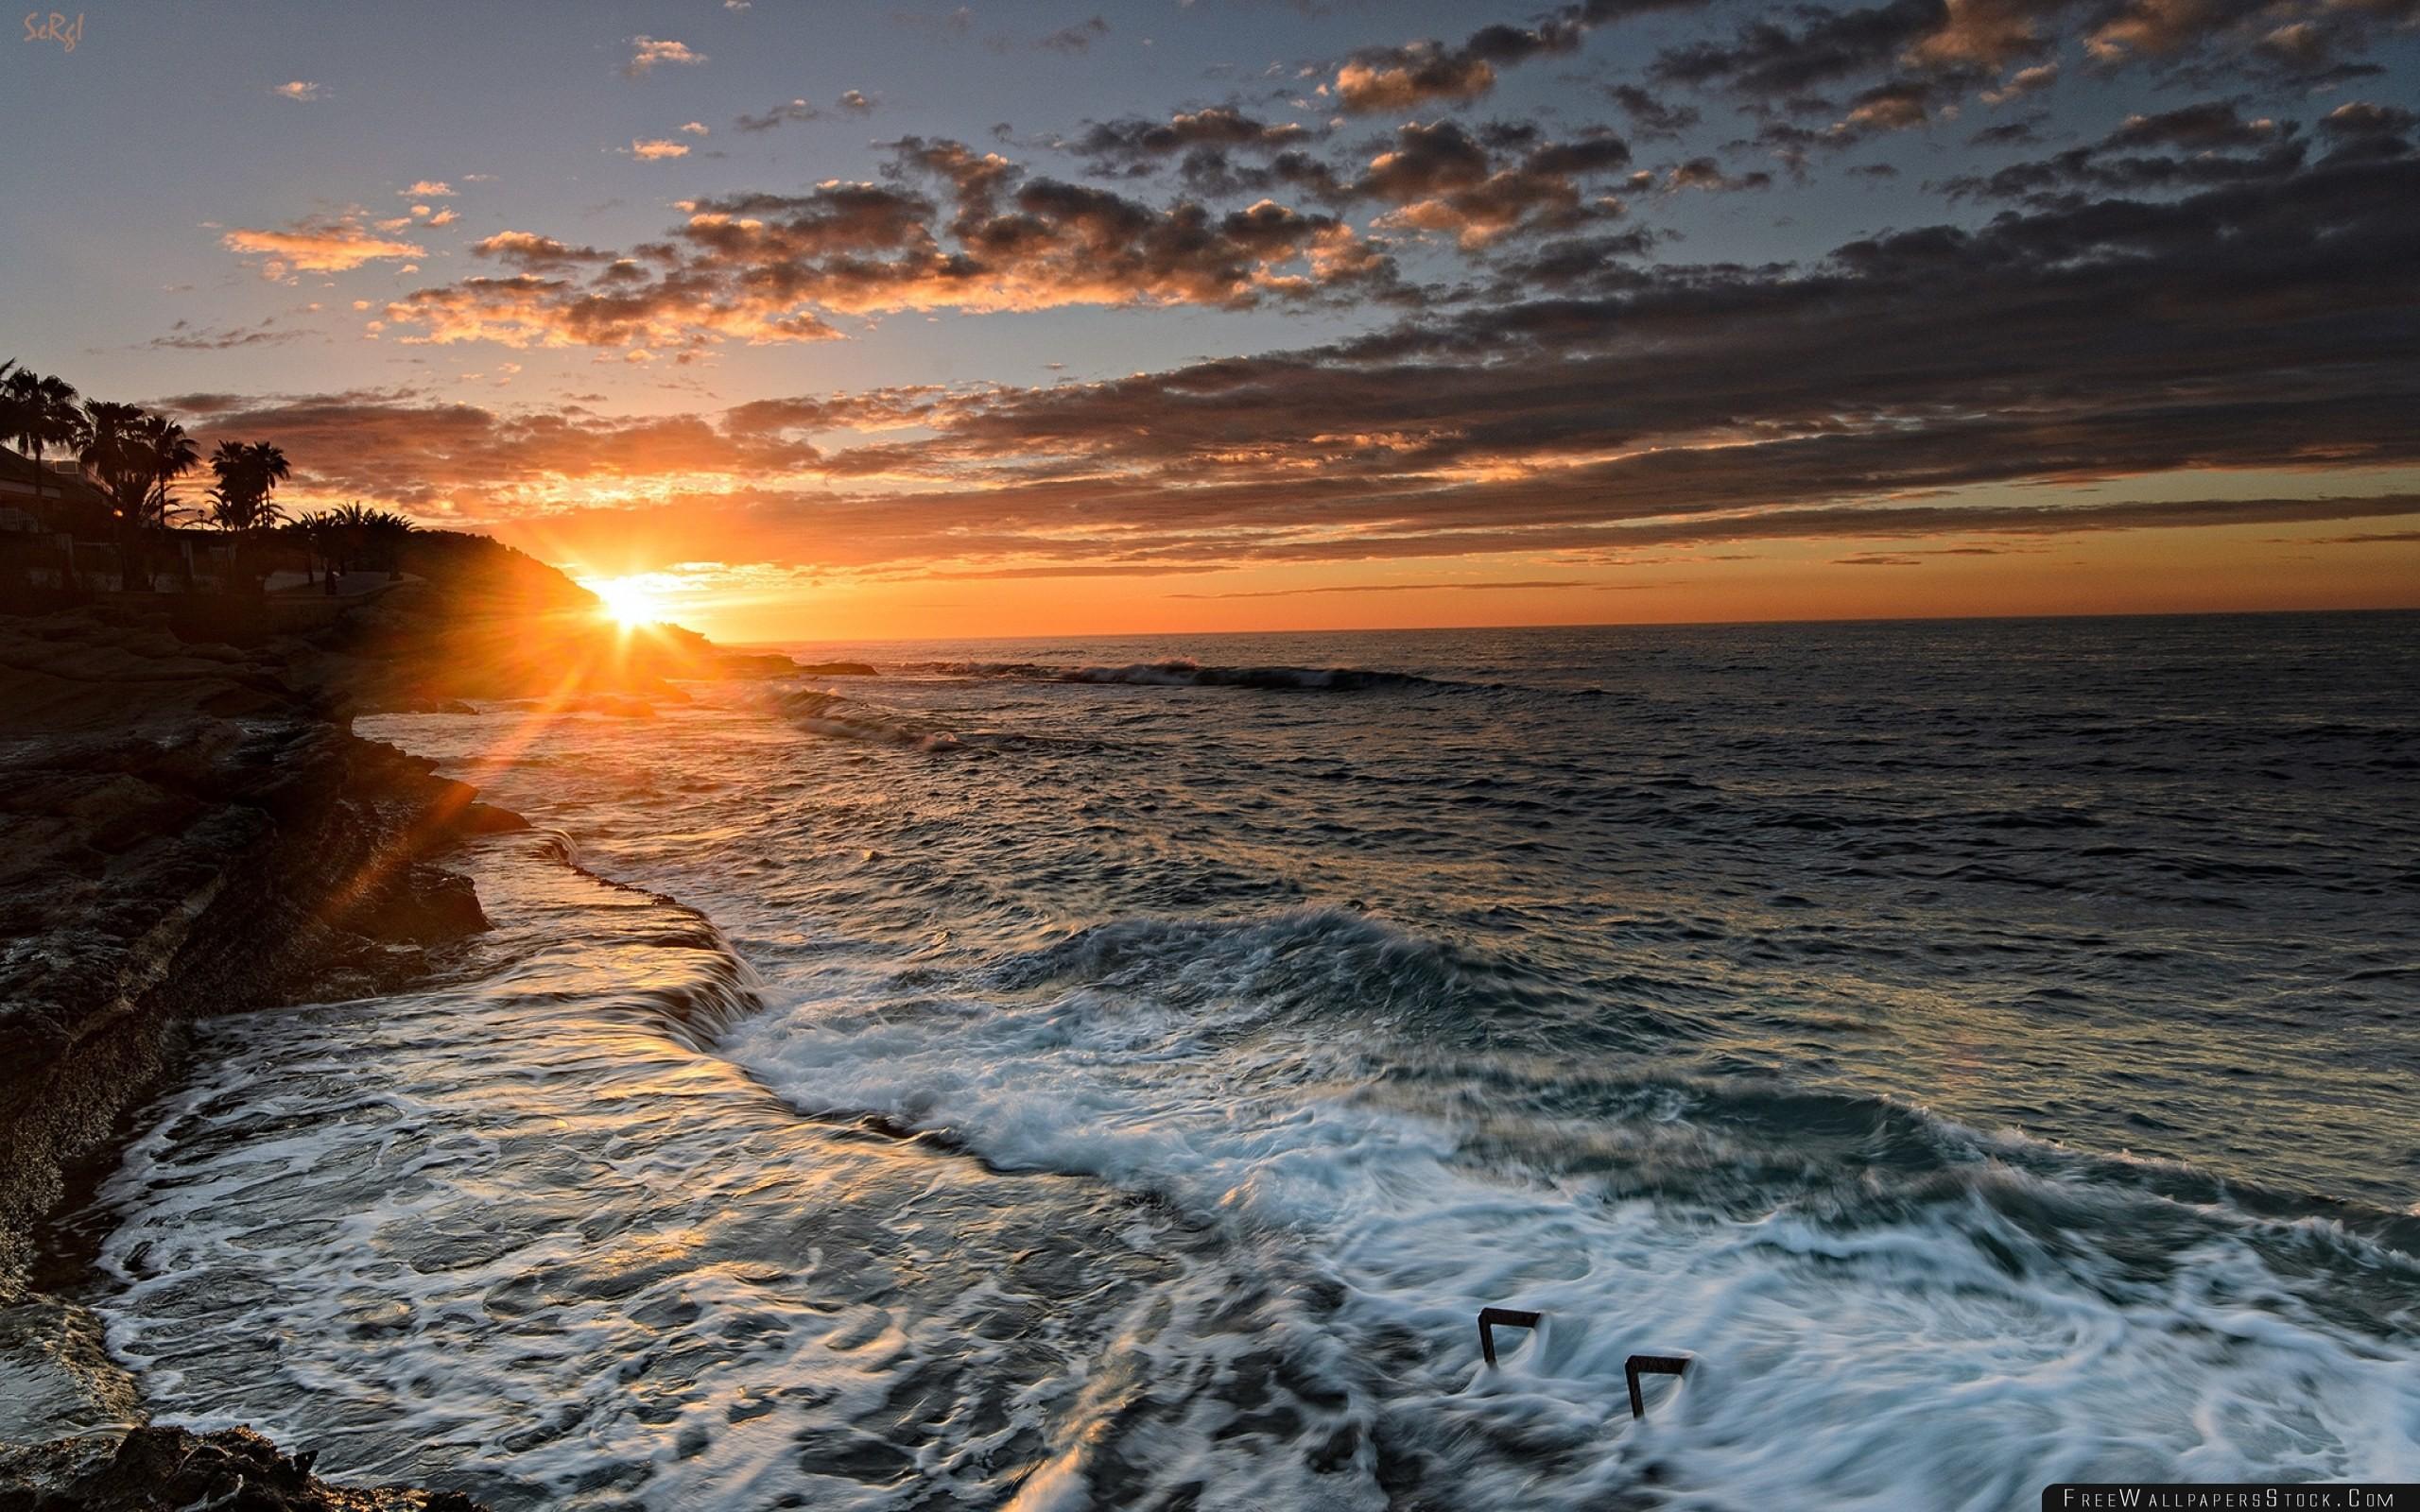 Res: 2560x1600, Alicante Valencia Spain The Mediterranean Sea Sunset Wallpaper